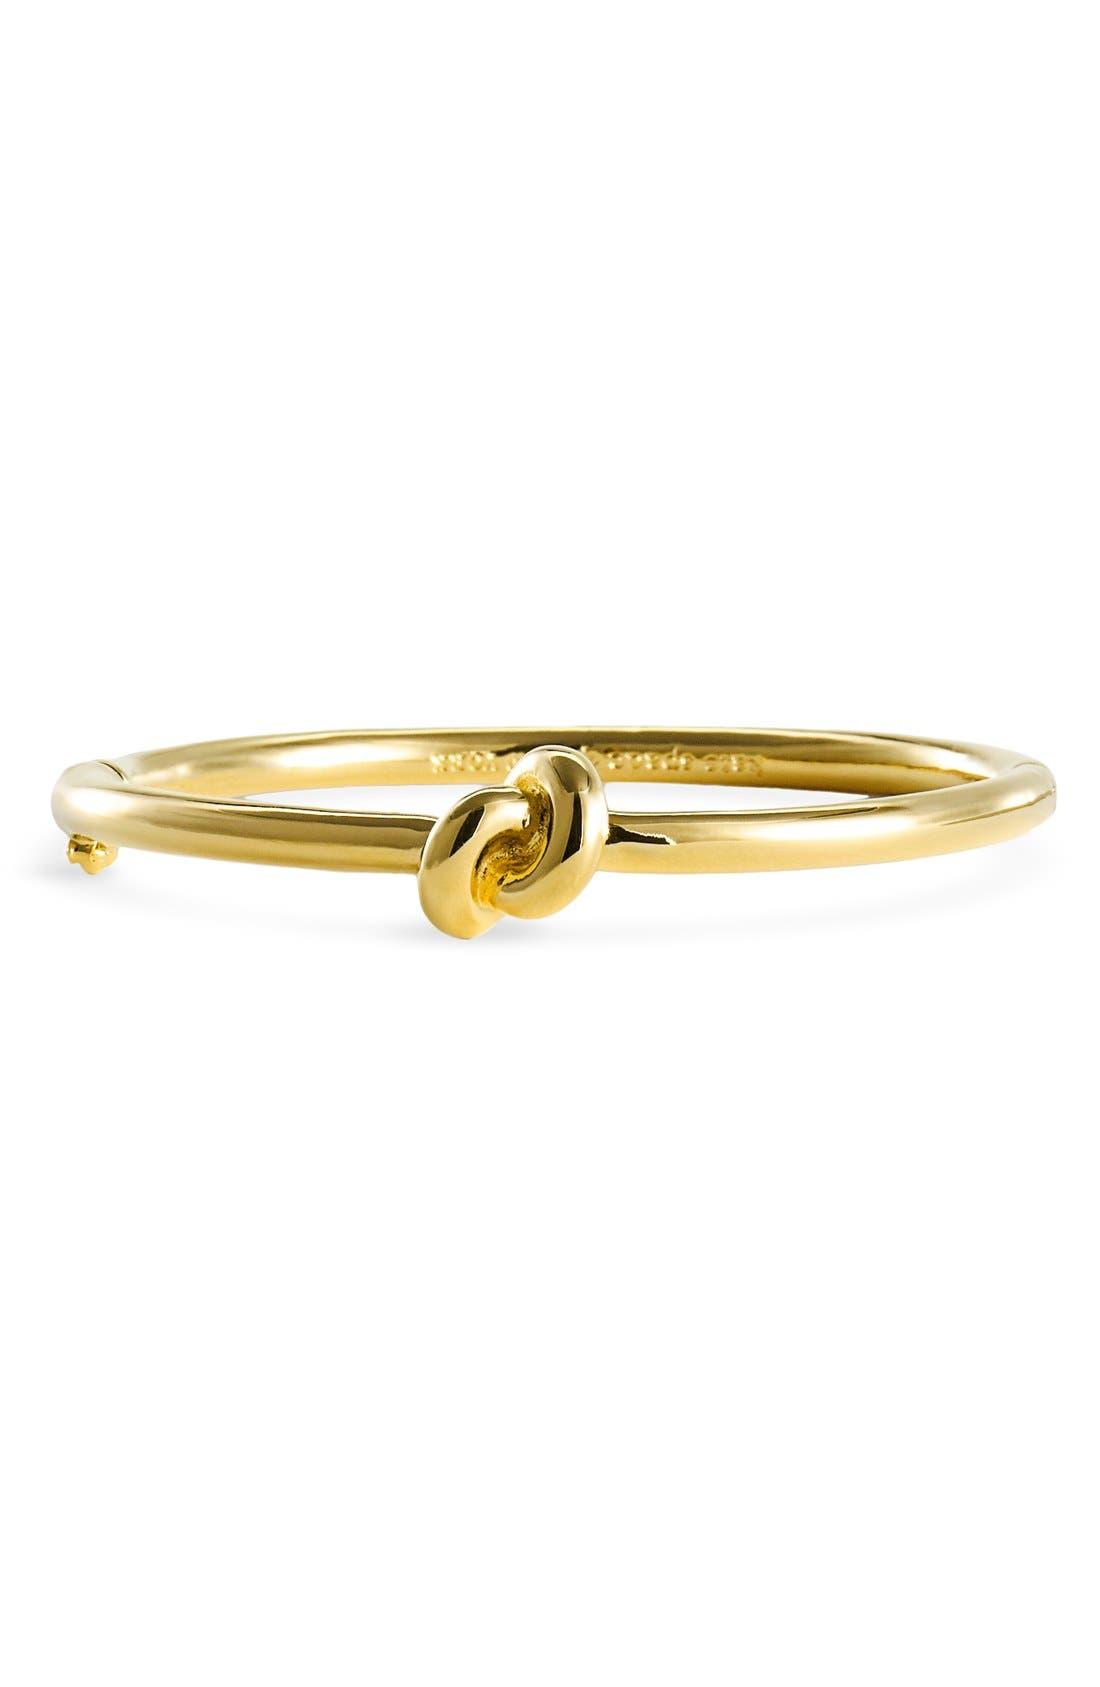 KATE SPADE NEW YORK, 'sailors knot' bangle, Alternate thumbnail 2, color, GOLD